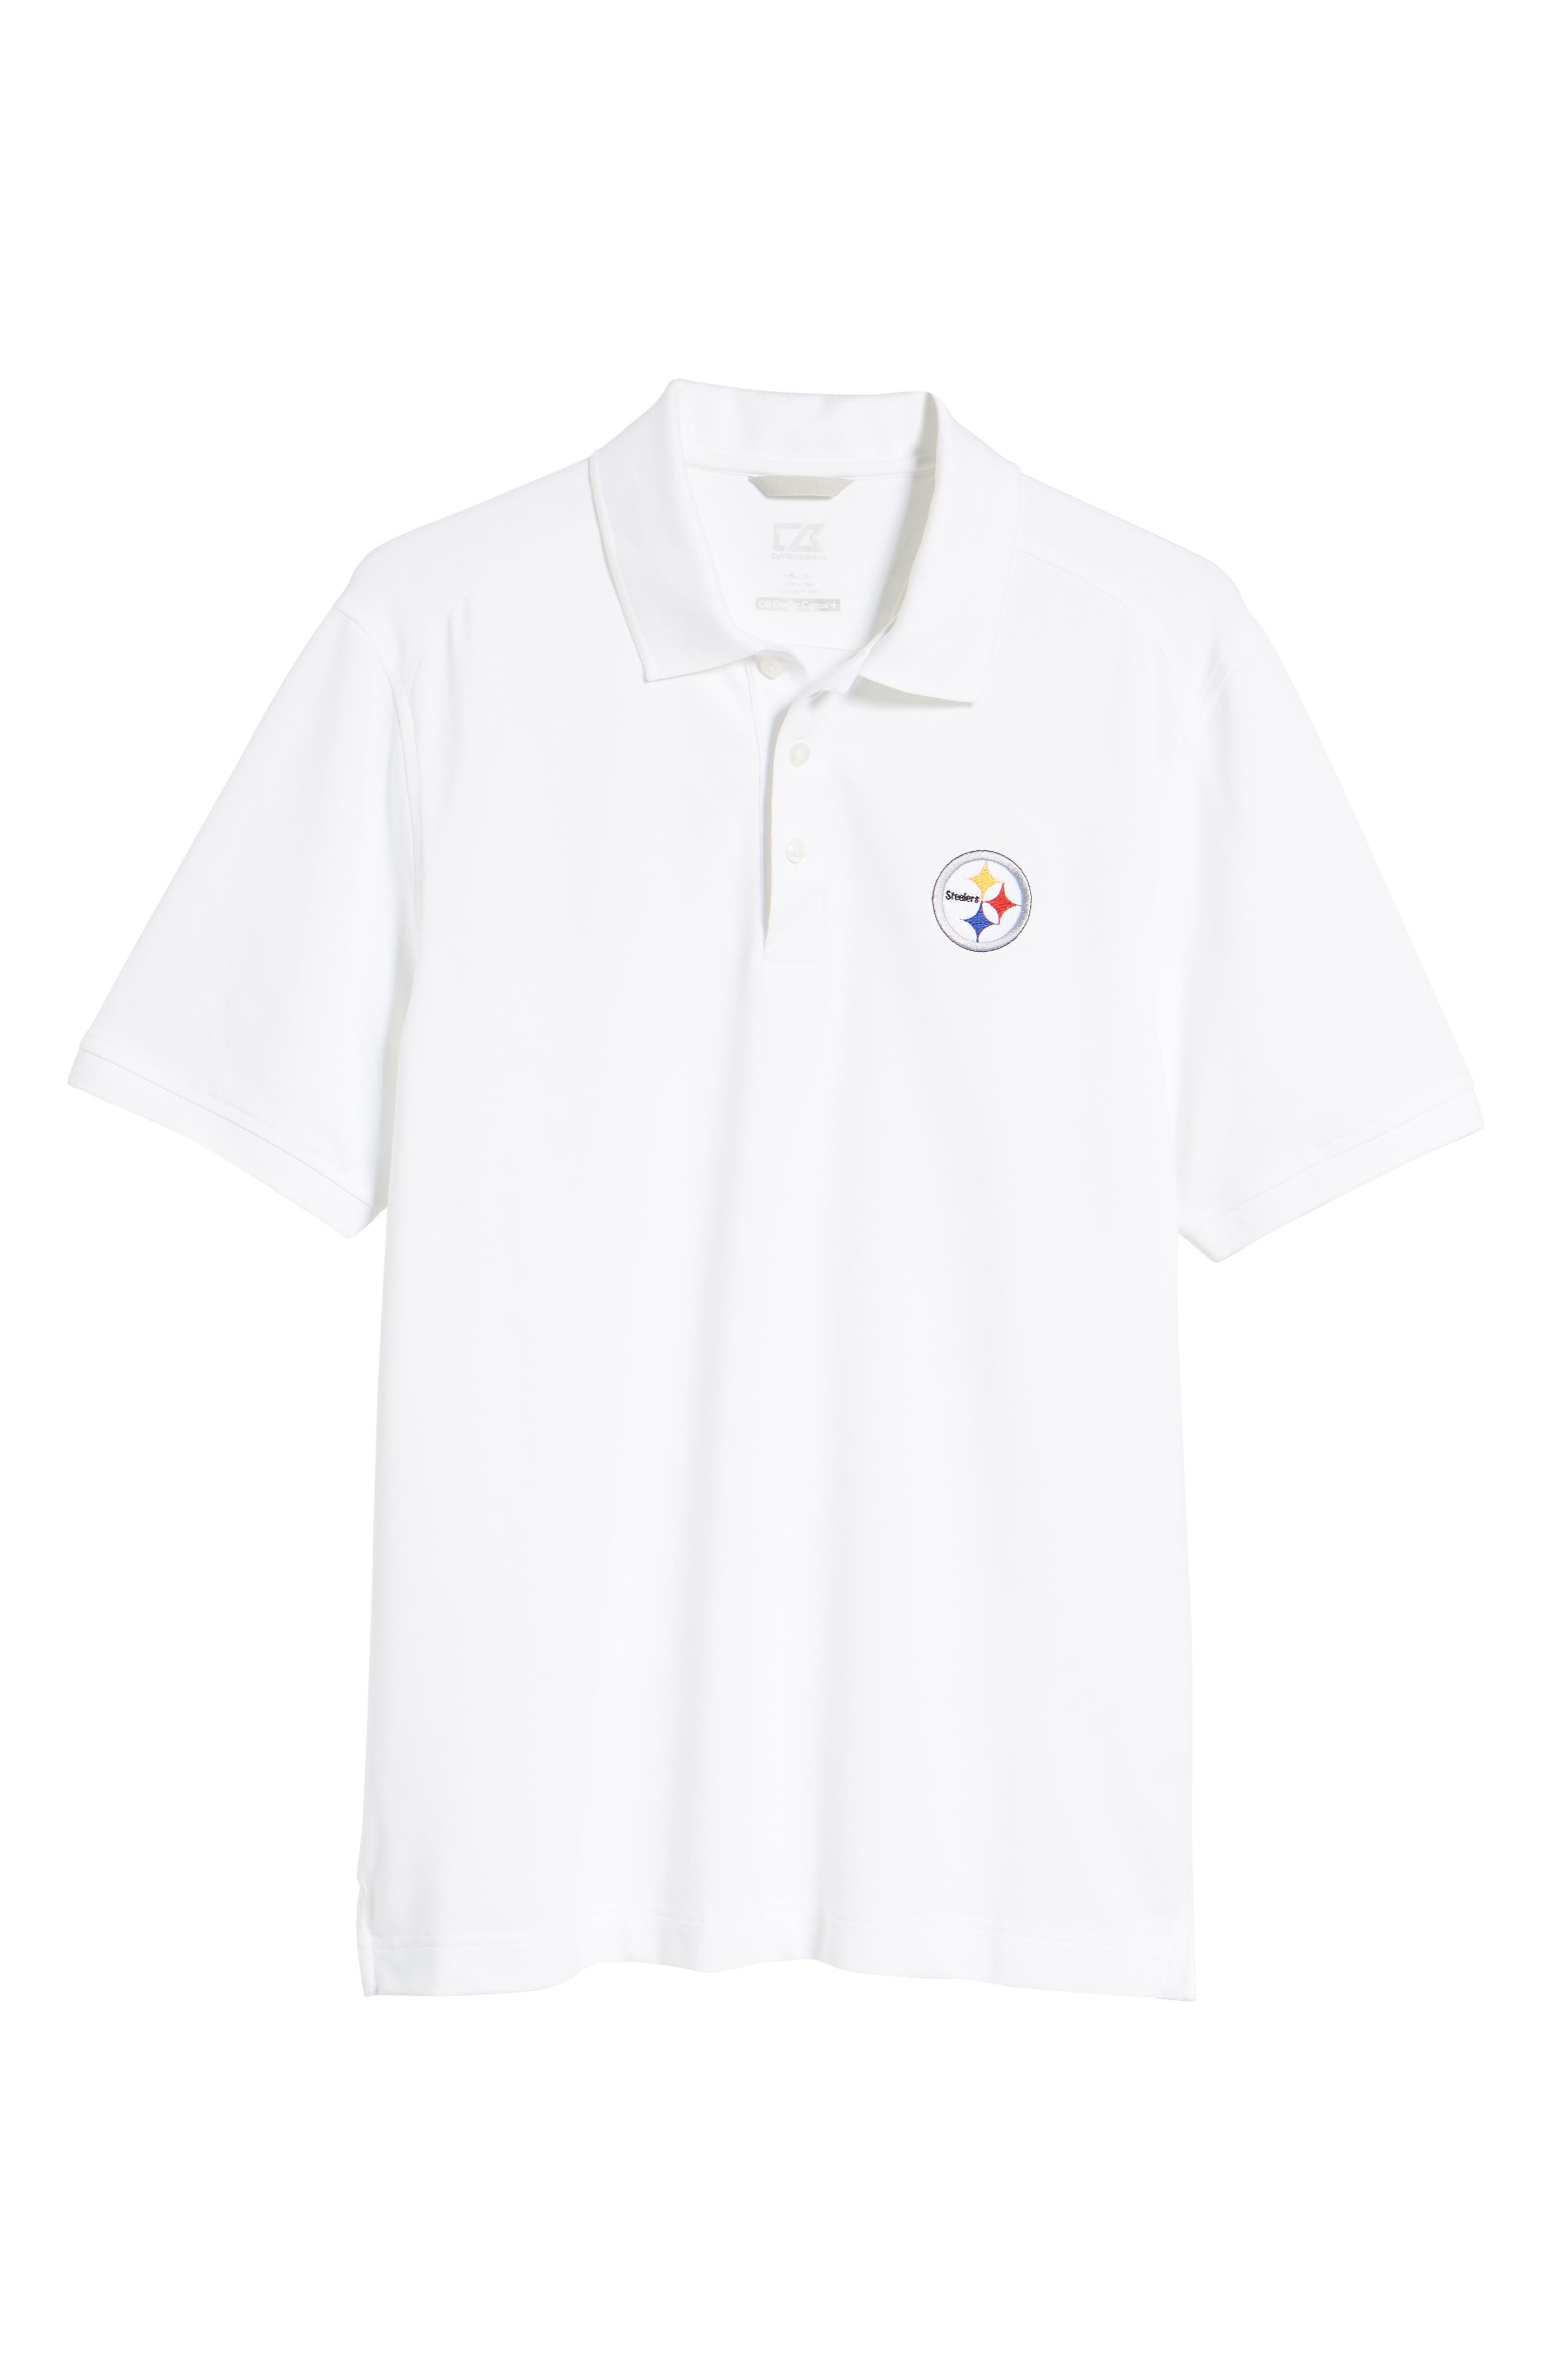 Pittsburgh Steelers - Advantage Regular Fit DryTec Polo,                             Alternate thumbnail 4, color,                             White